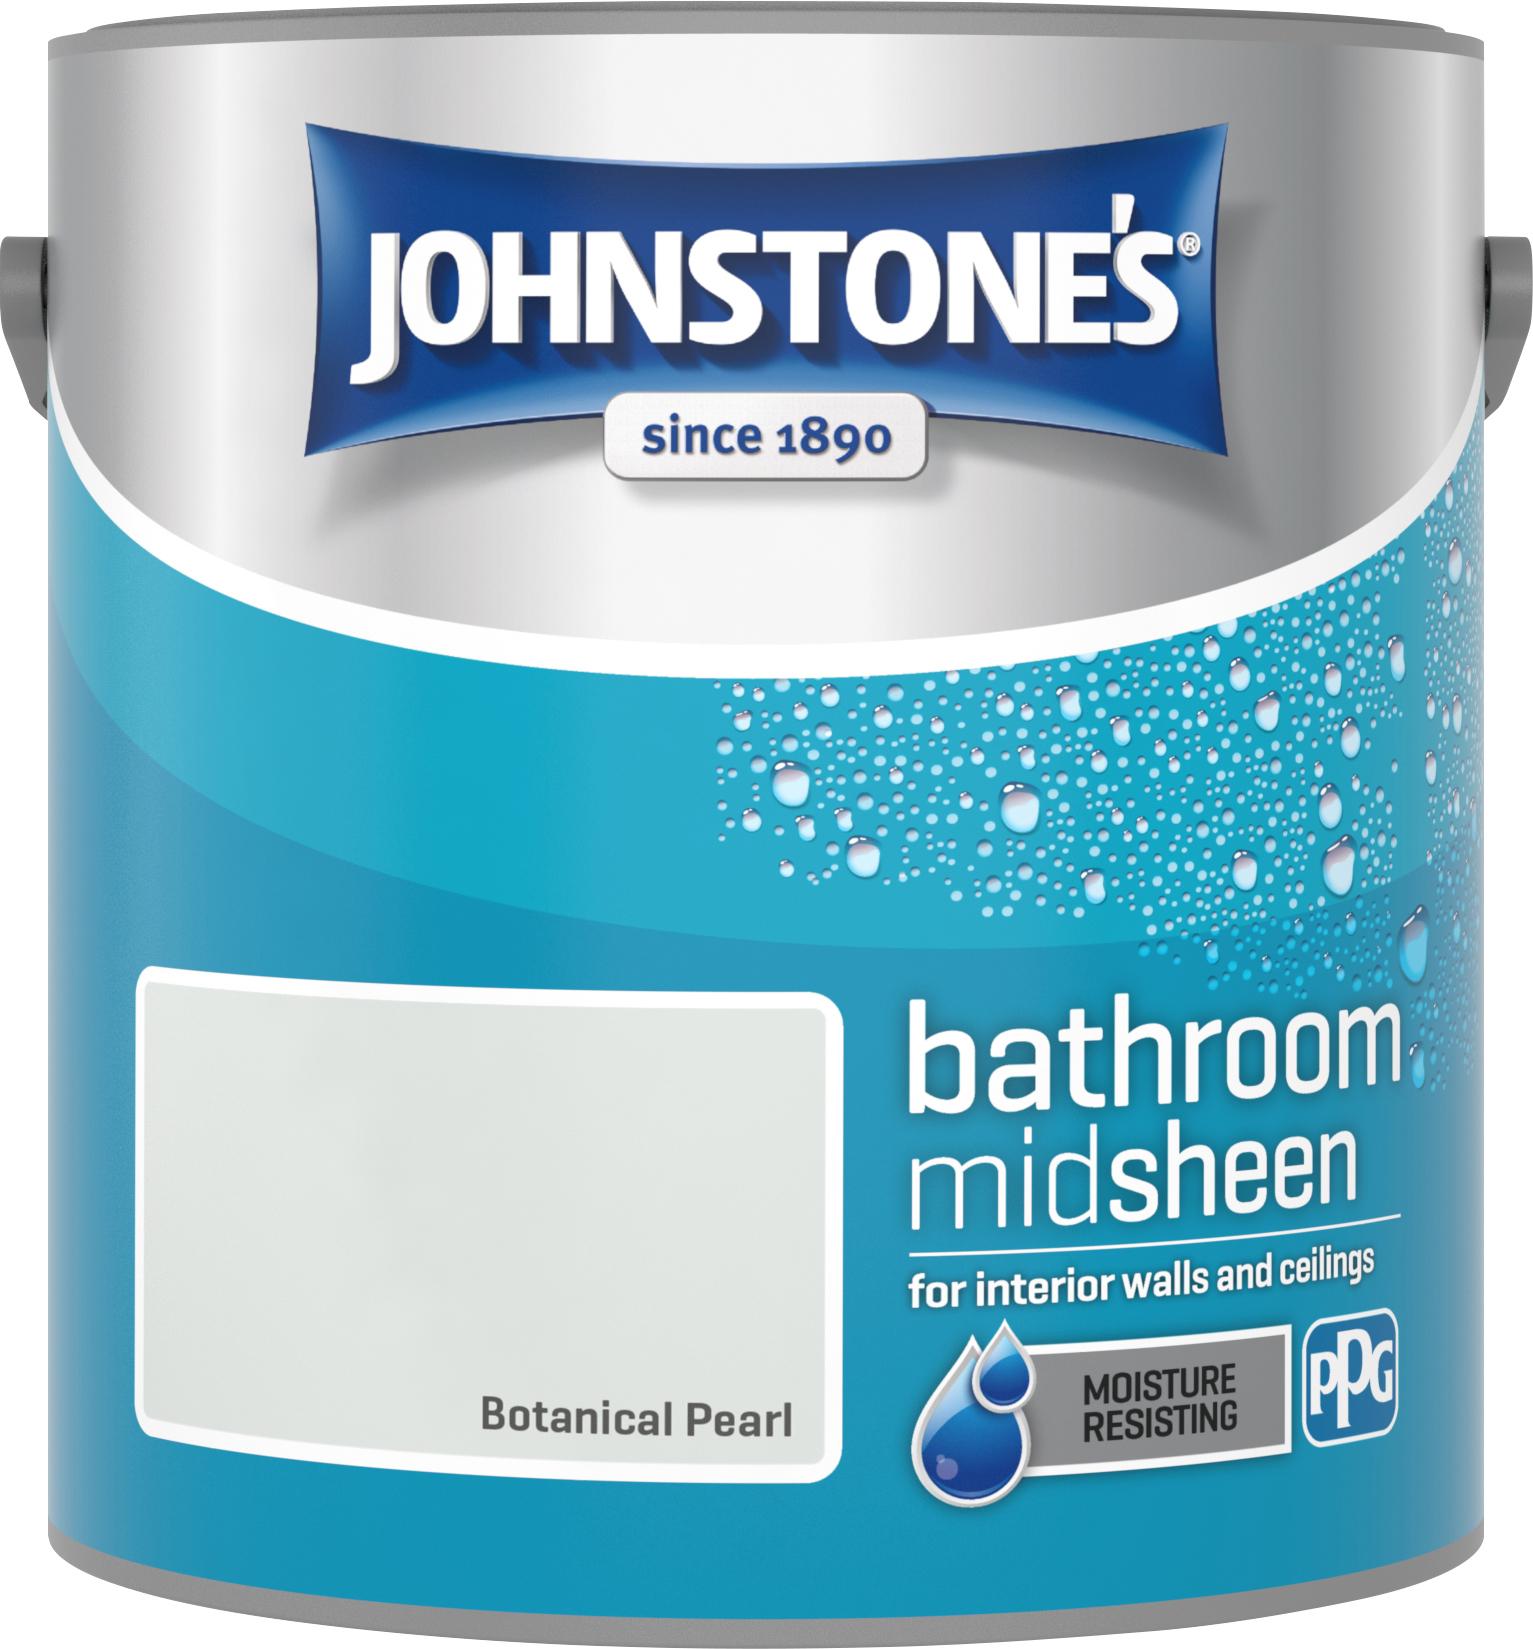 Johnstone's 2.5 Litre Bathroom Paint - Botanical Pearl